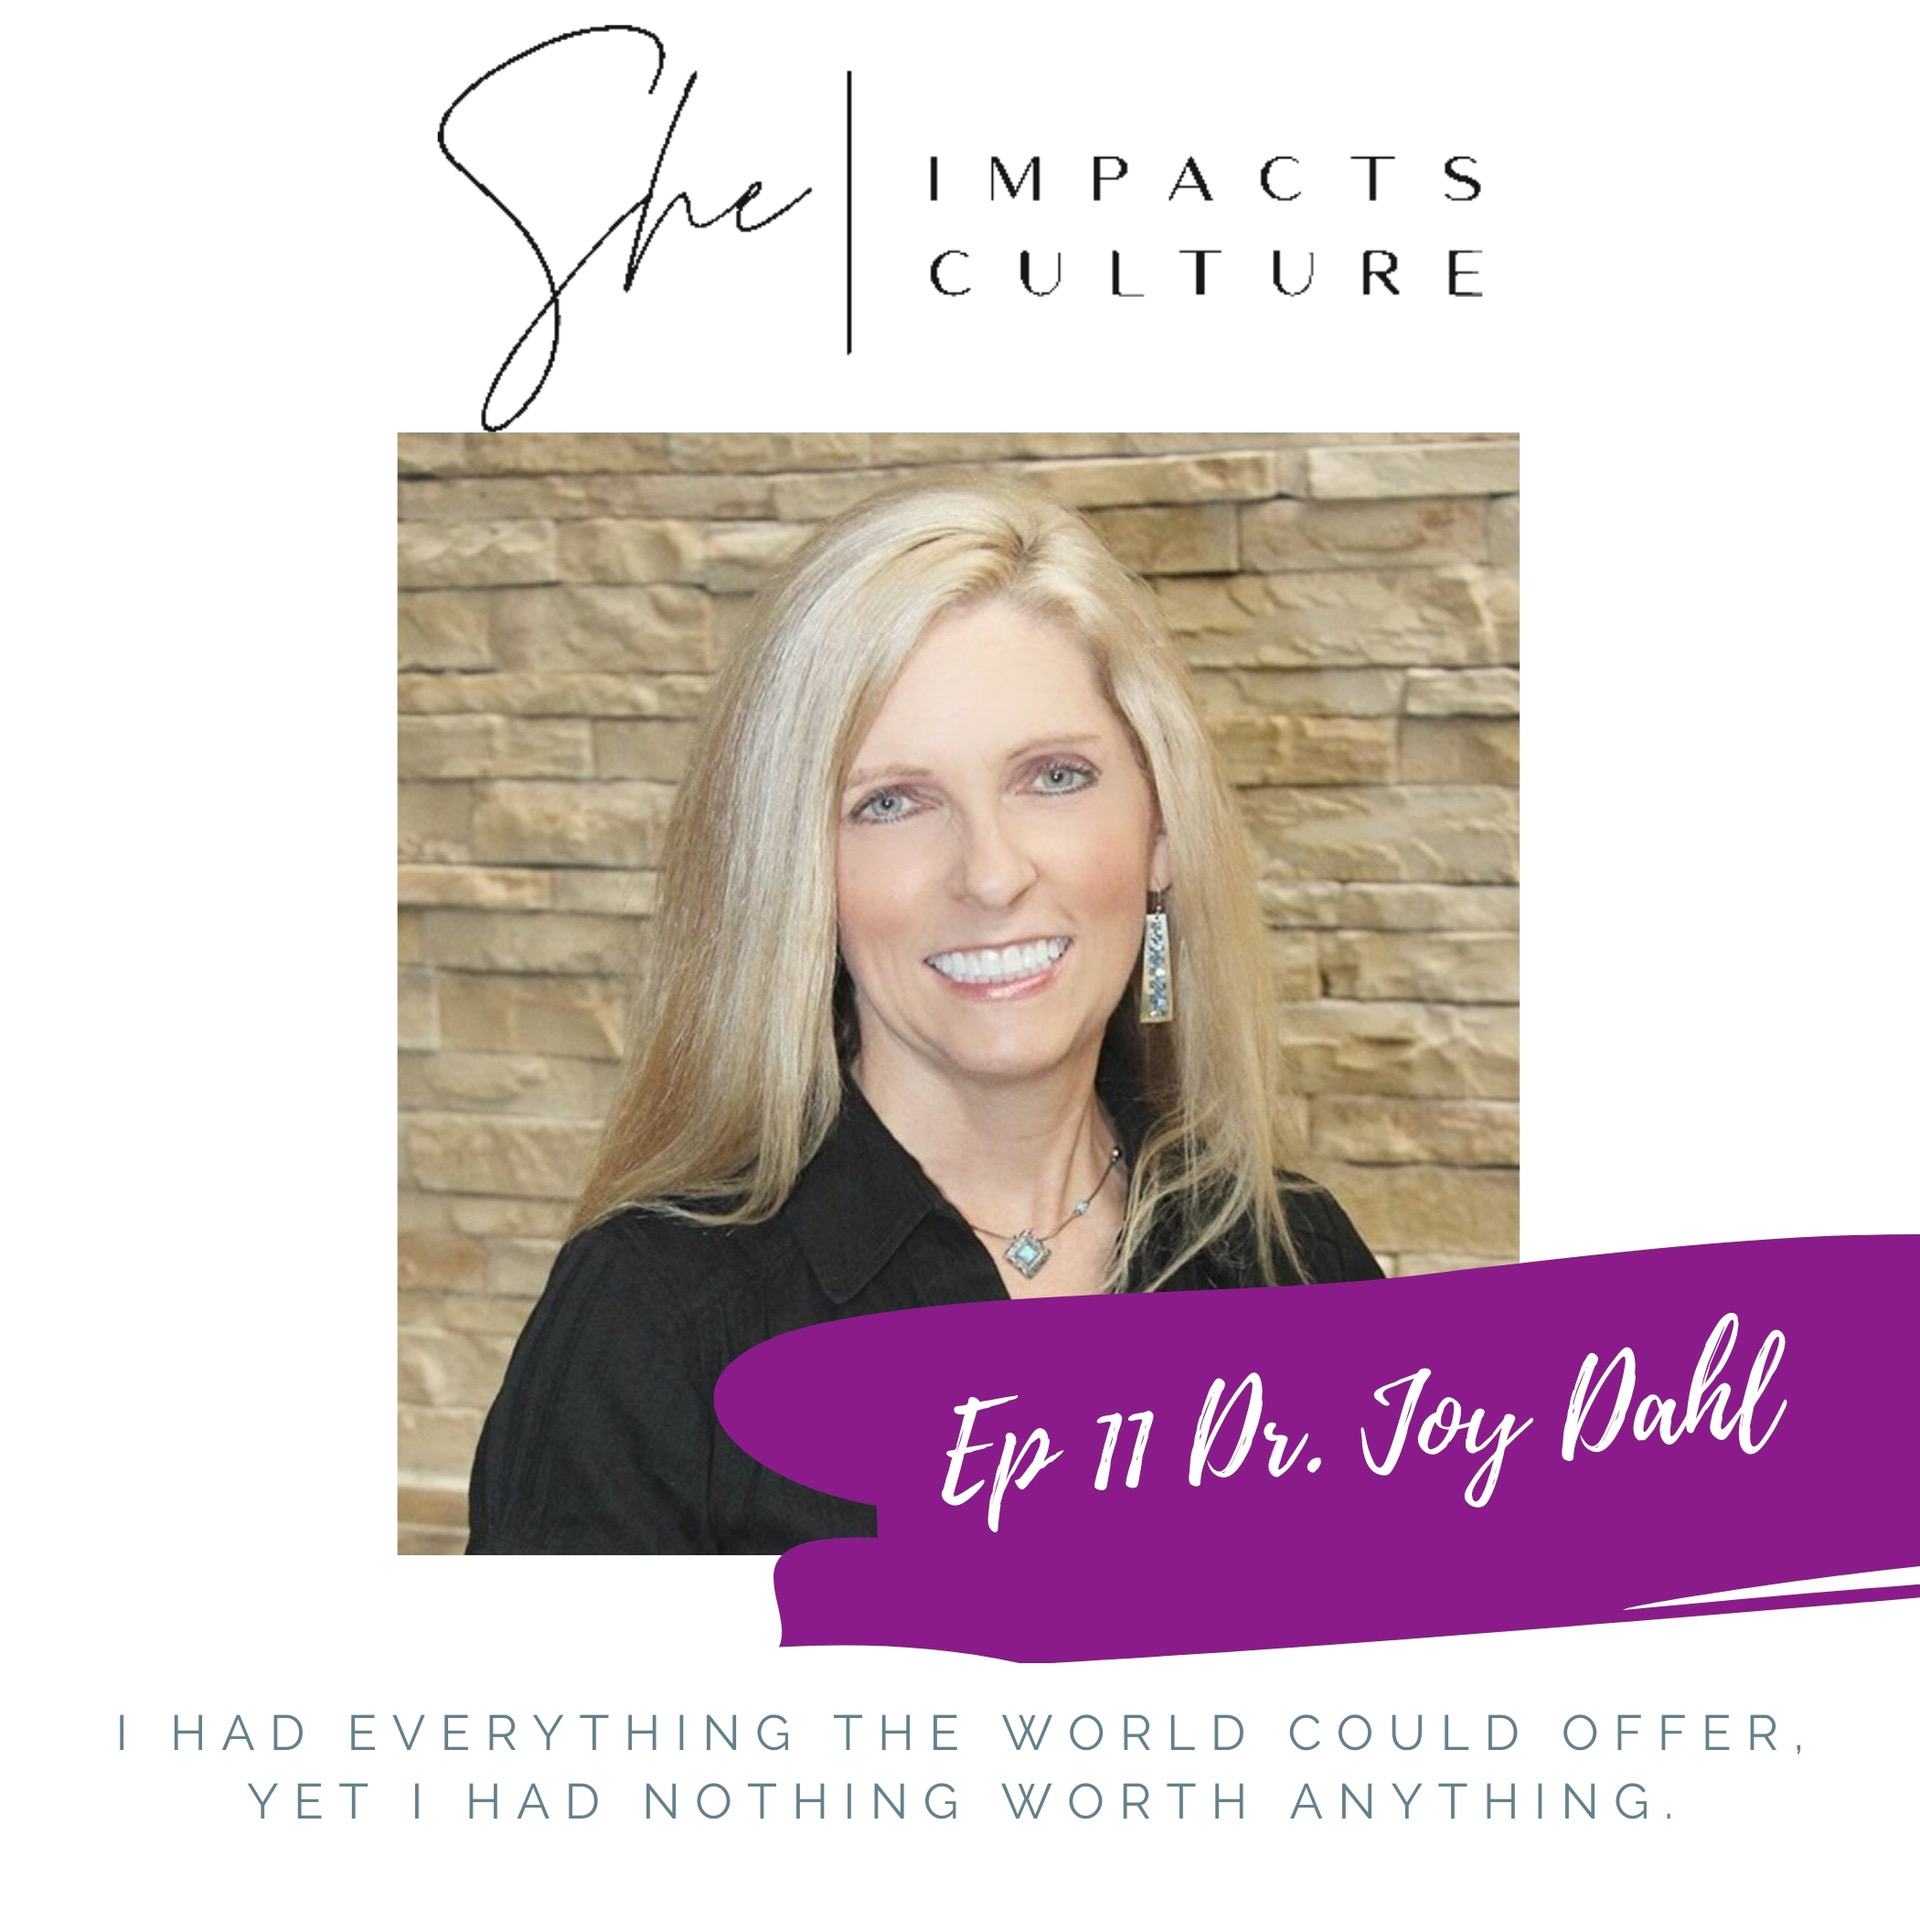 She Impacts Culture Podcast Episode #11, Dr. Joy Dahl, You Are An Ambassador!